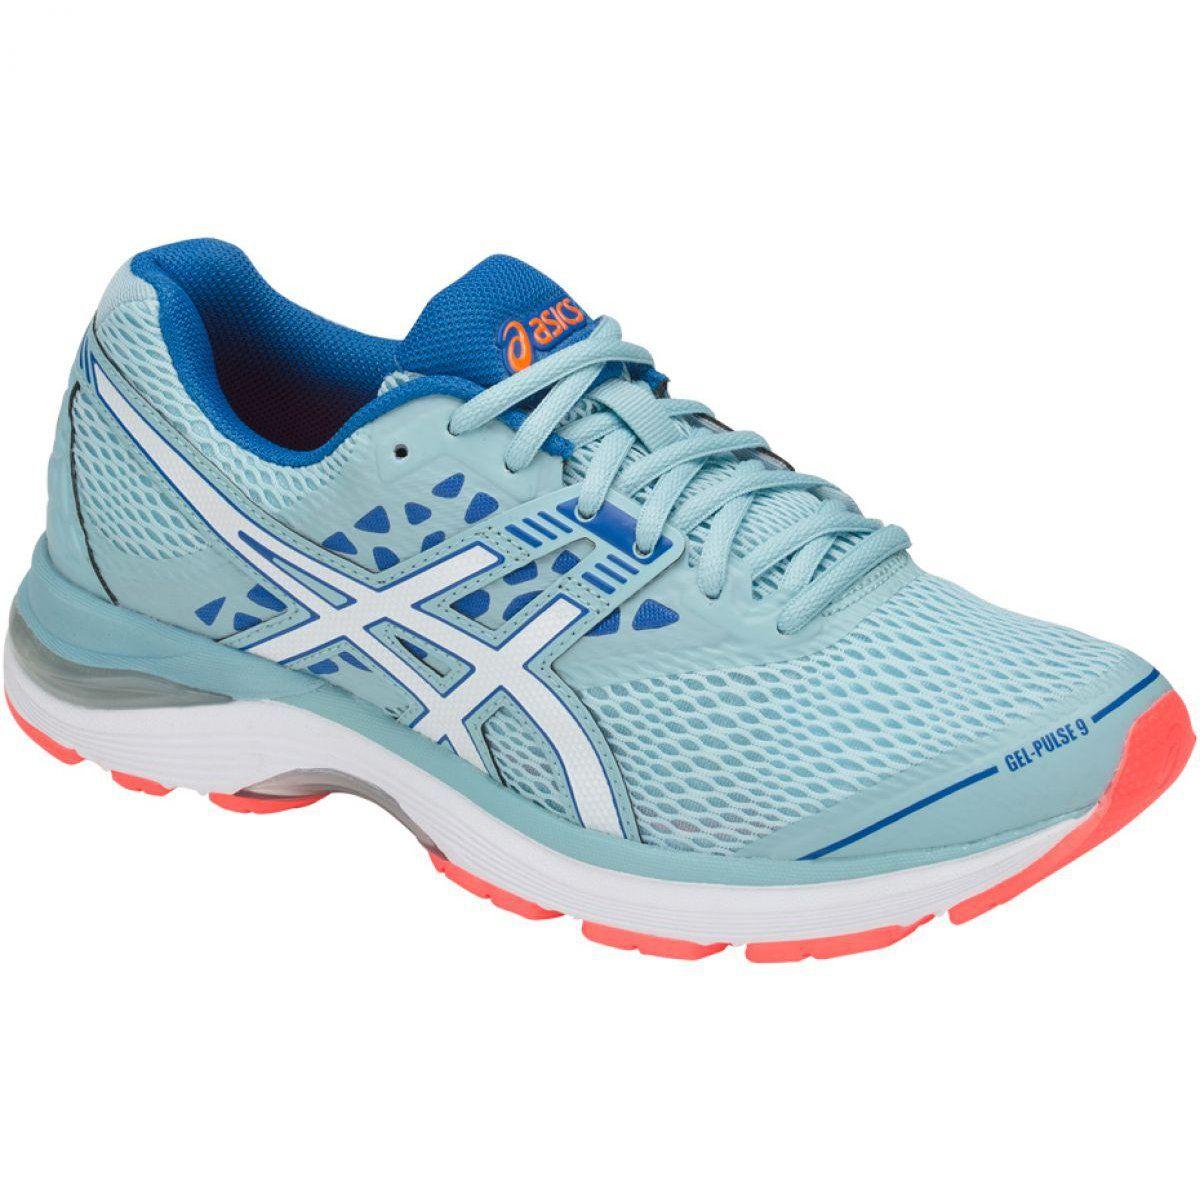 Asics Gel Pulse 9 W T7d8n 1401 Blue Asics Running Shoes Design Asics Running Shoes